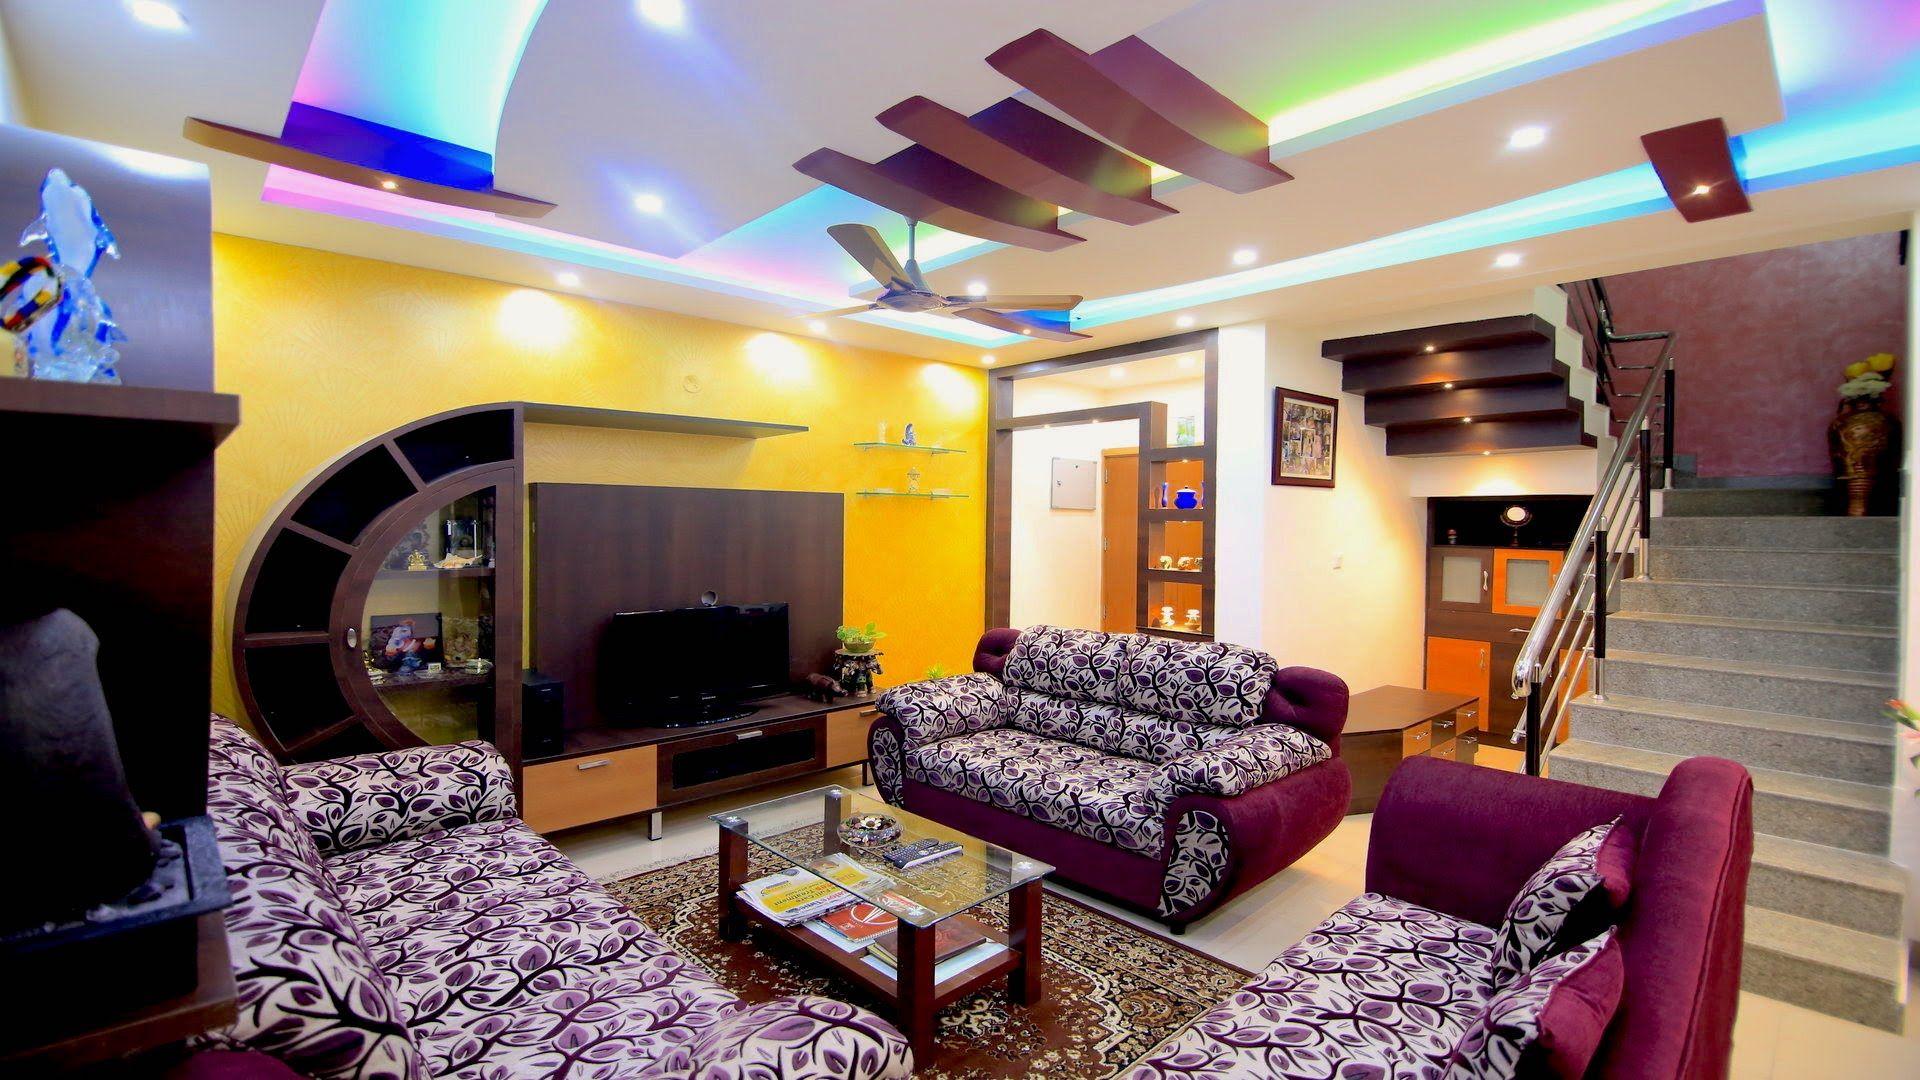 Mr Srinivasa S House Latest Interior Design Mantri Alpyne Apartment Latest Interior Design House Furniture Design Latest Furniture Designs